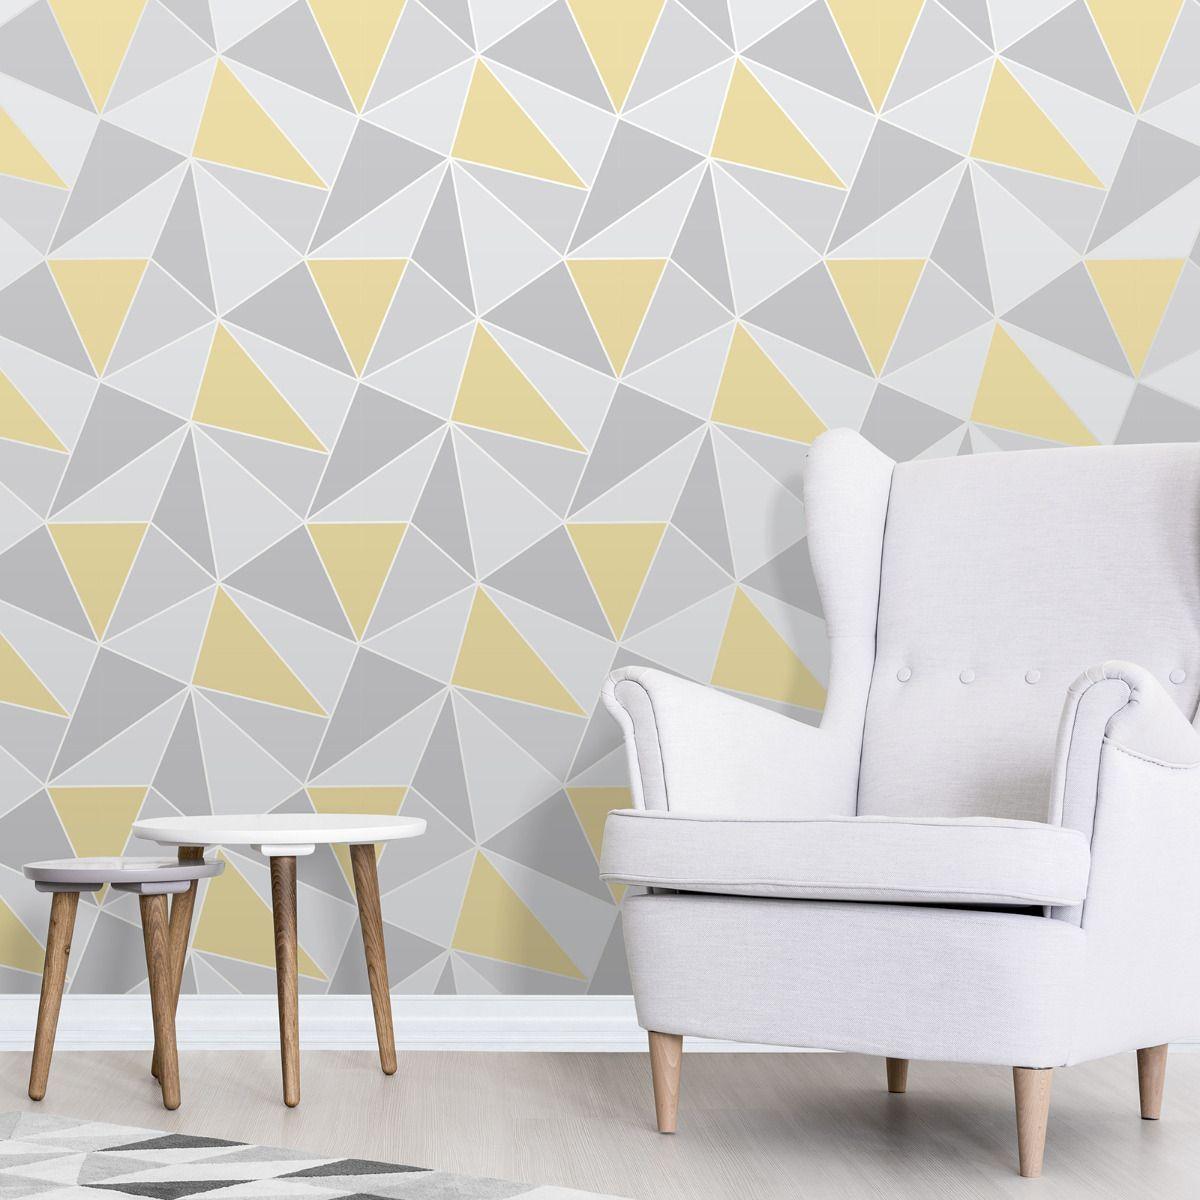 Living Room Yellow Decor Apex Geometric Wallpaper Yellow And Grey Fine Decor Fd41991 Liv Yellow Geometric Wallpaper Living Room Decor Gray Grey Wallpaper